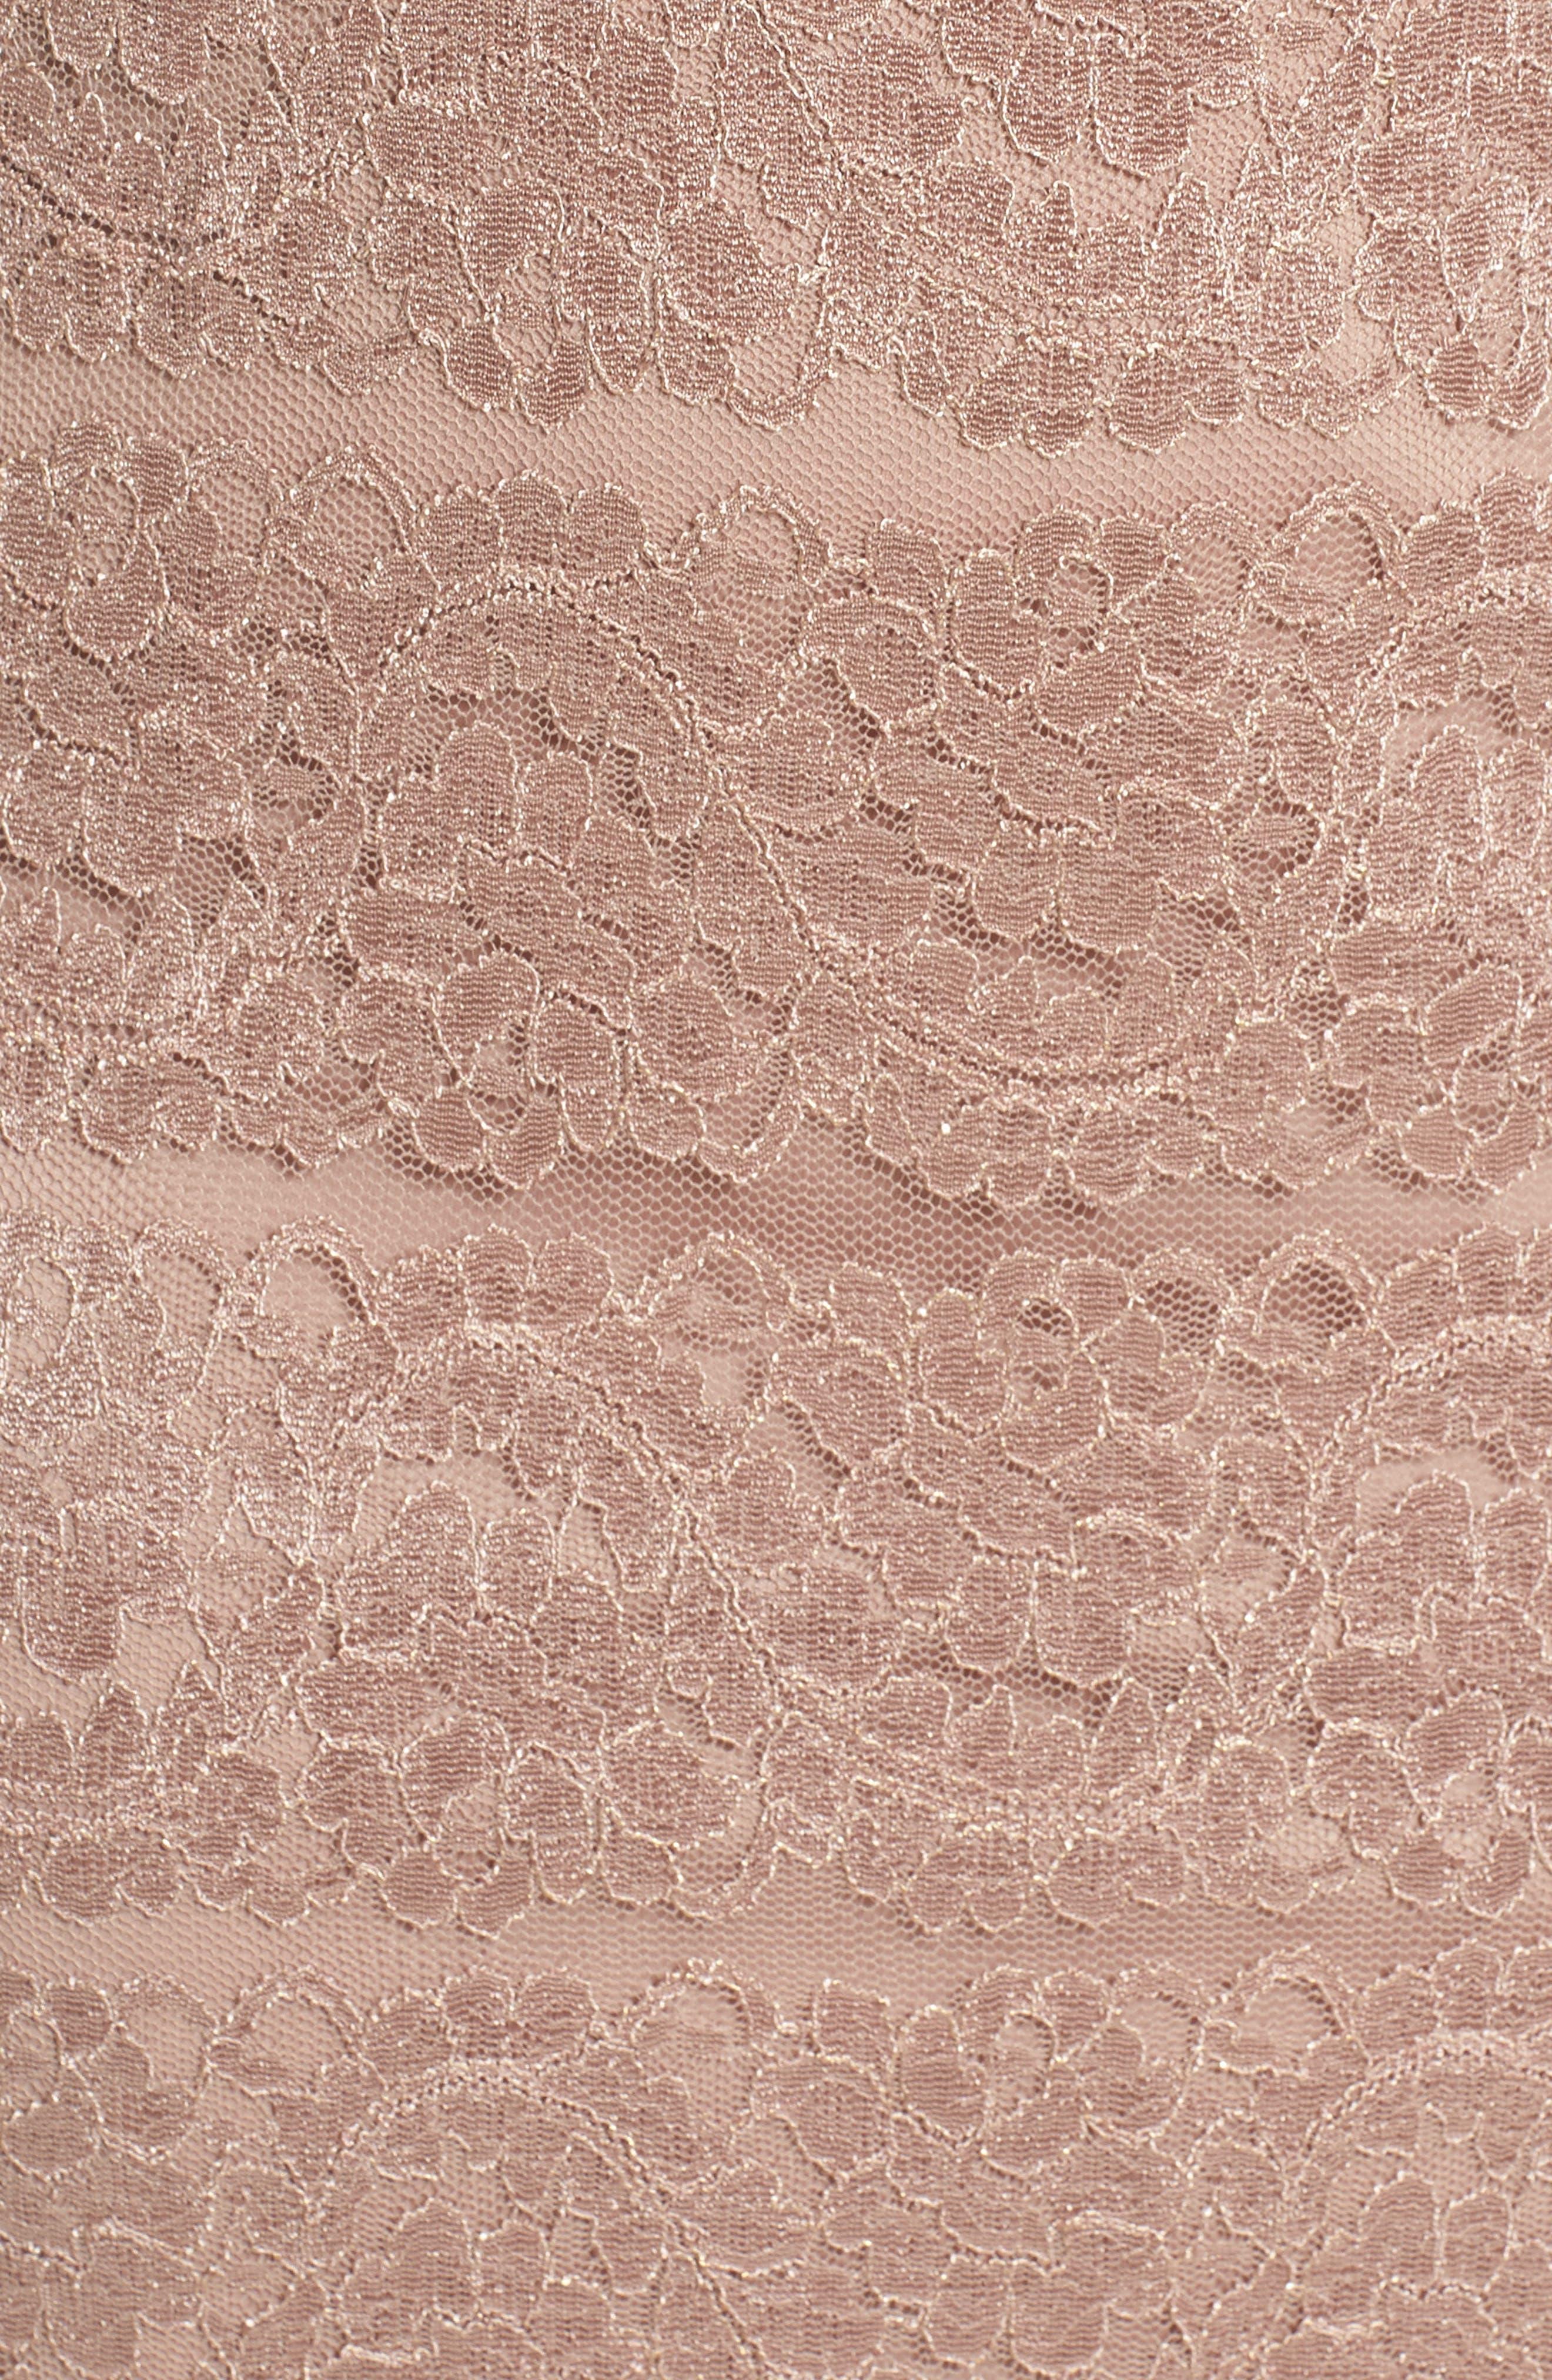 Lace Shift Dress,                             Alternate thumbnail 5, color,                             Almond